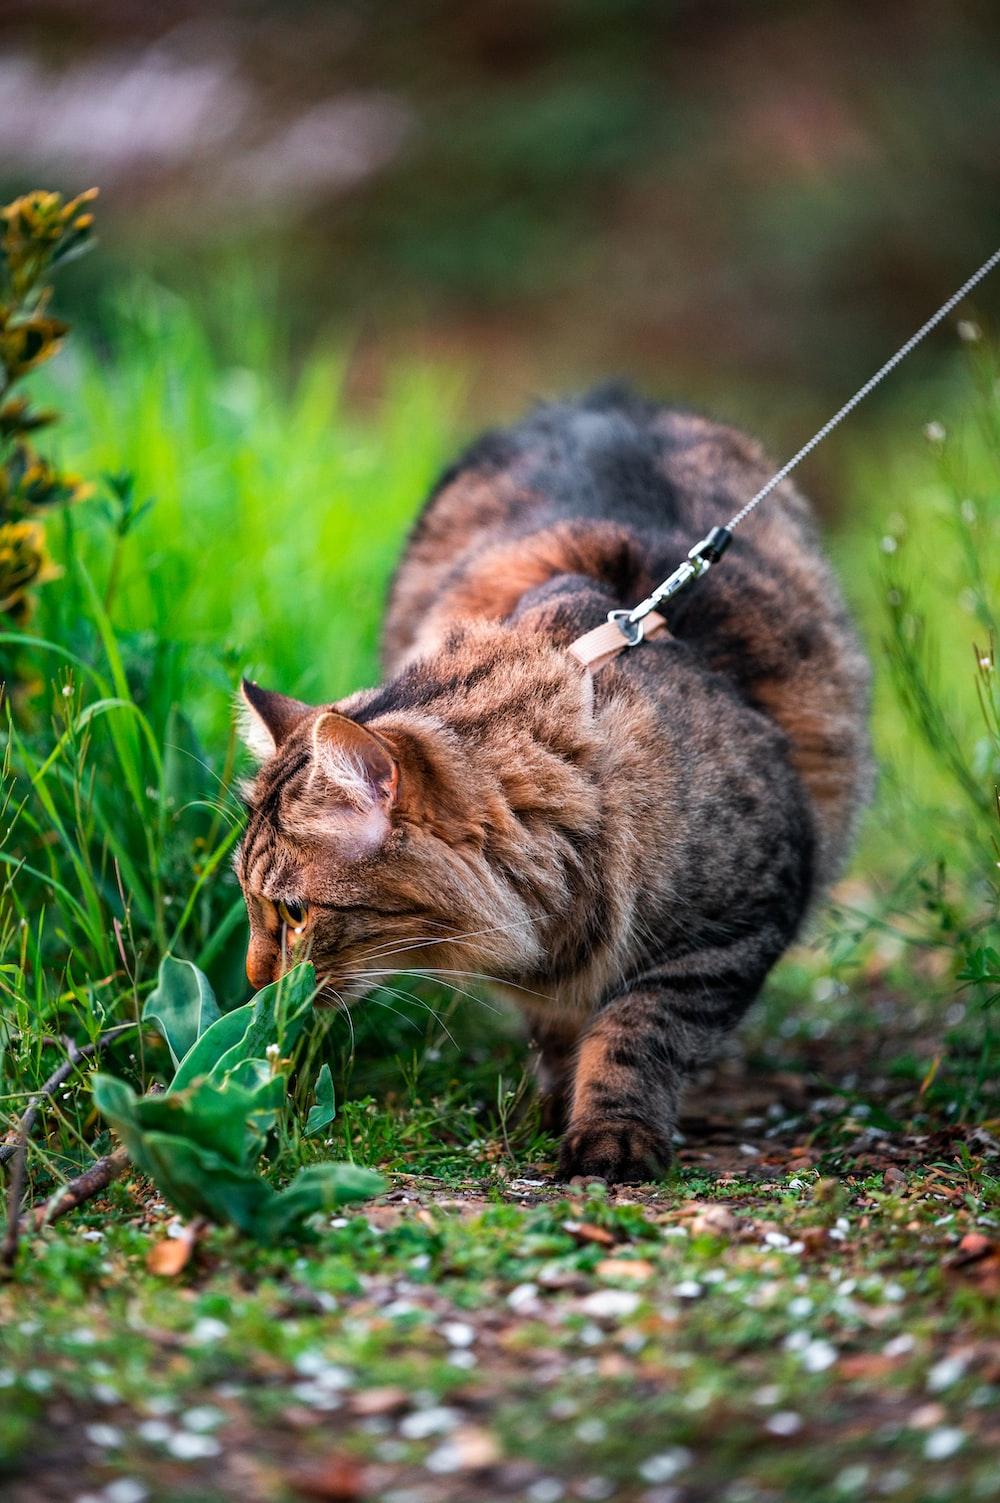 brown tabby cat on green grass field